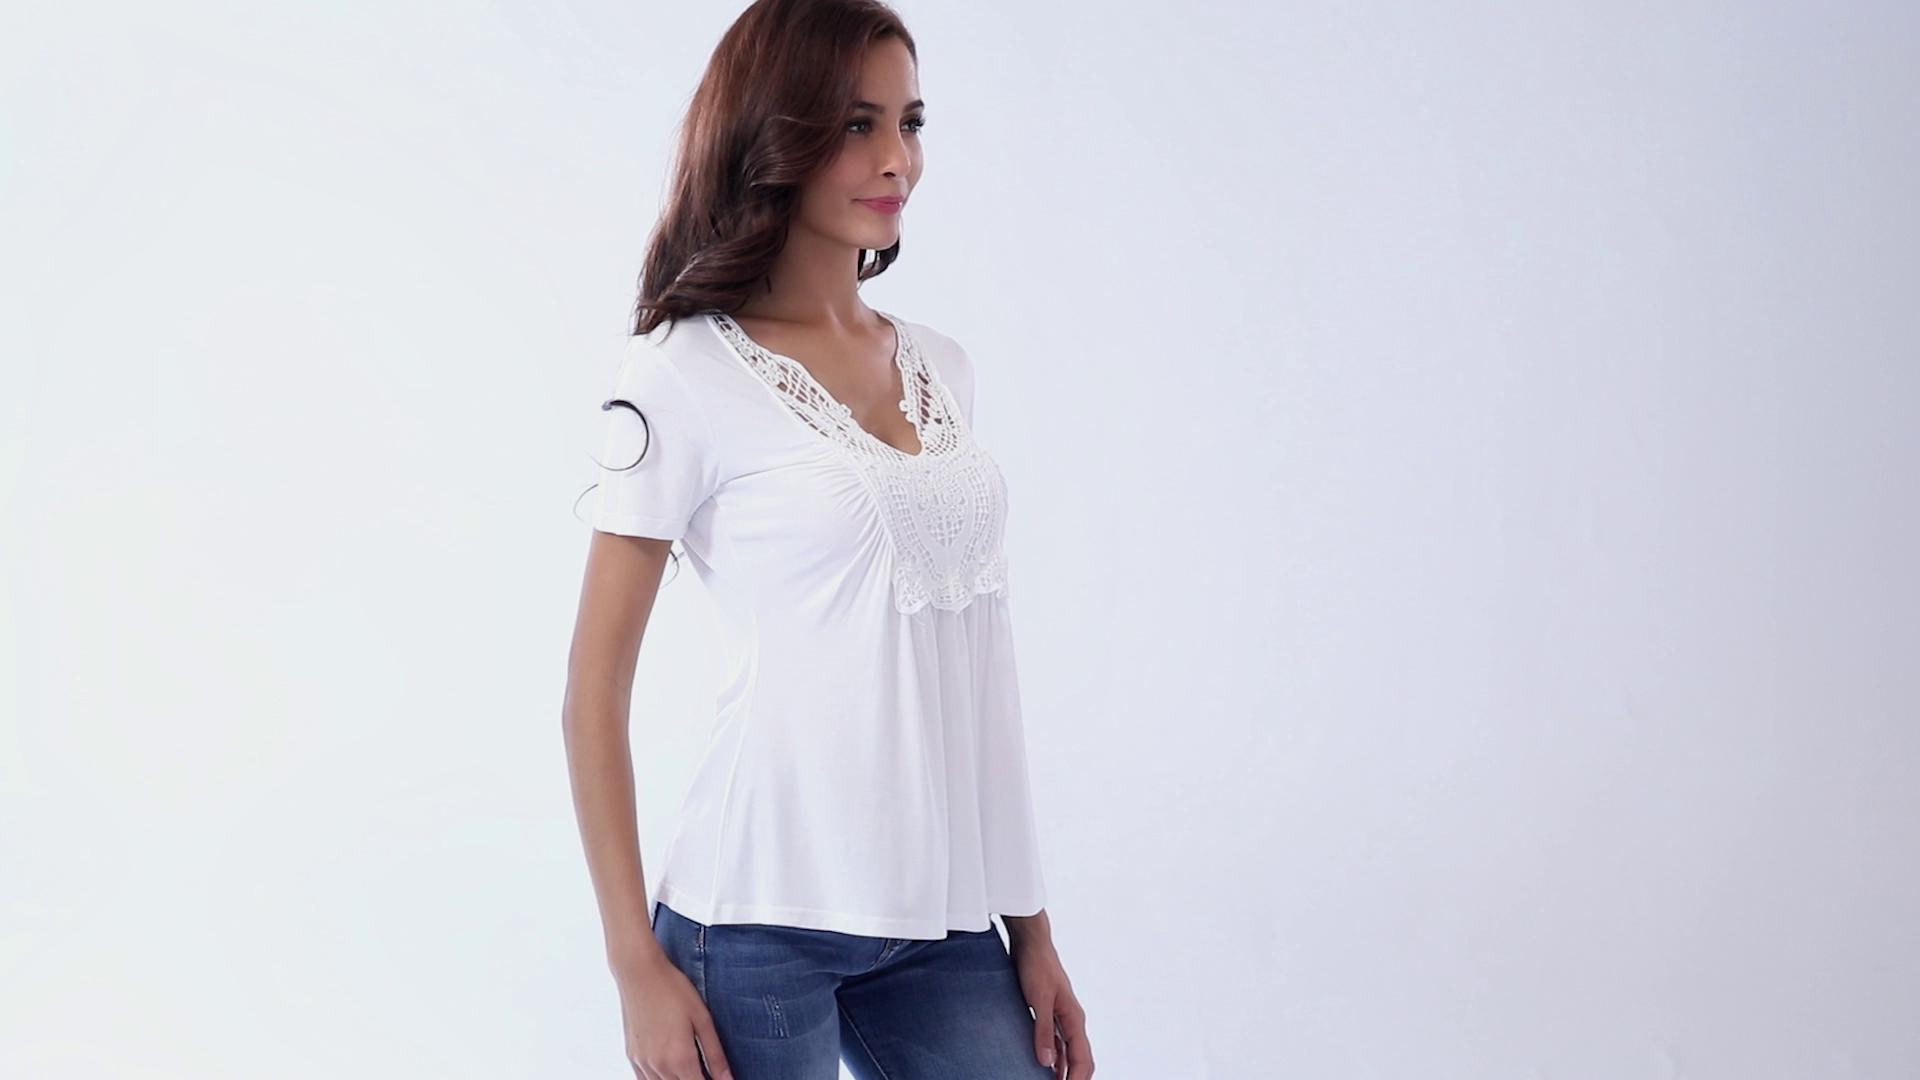 c561bf810de02 MISS MOLY Womens Ruched Front Tops Deep V Neck T Shirt Shot ...